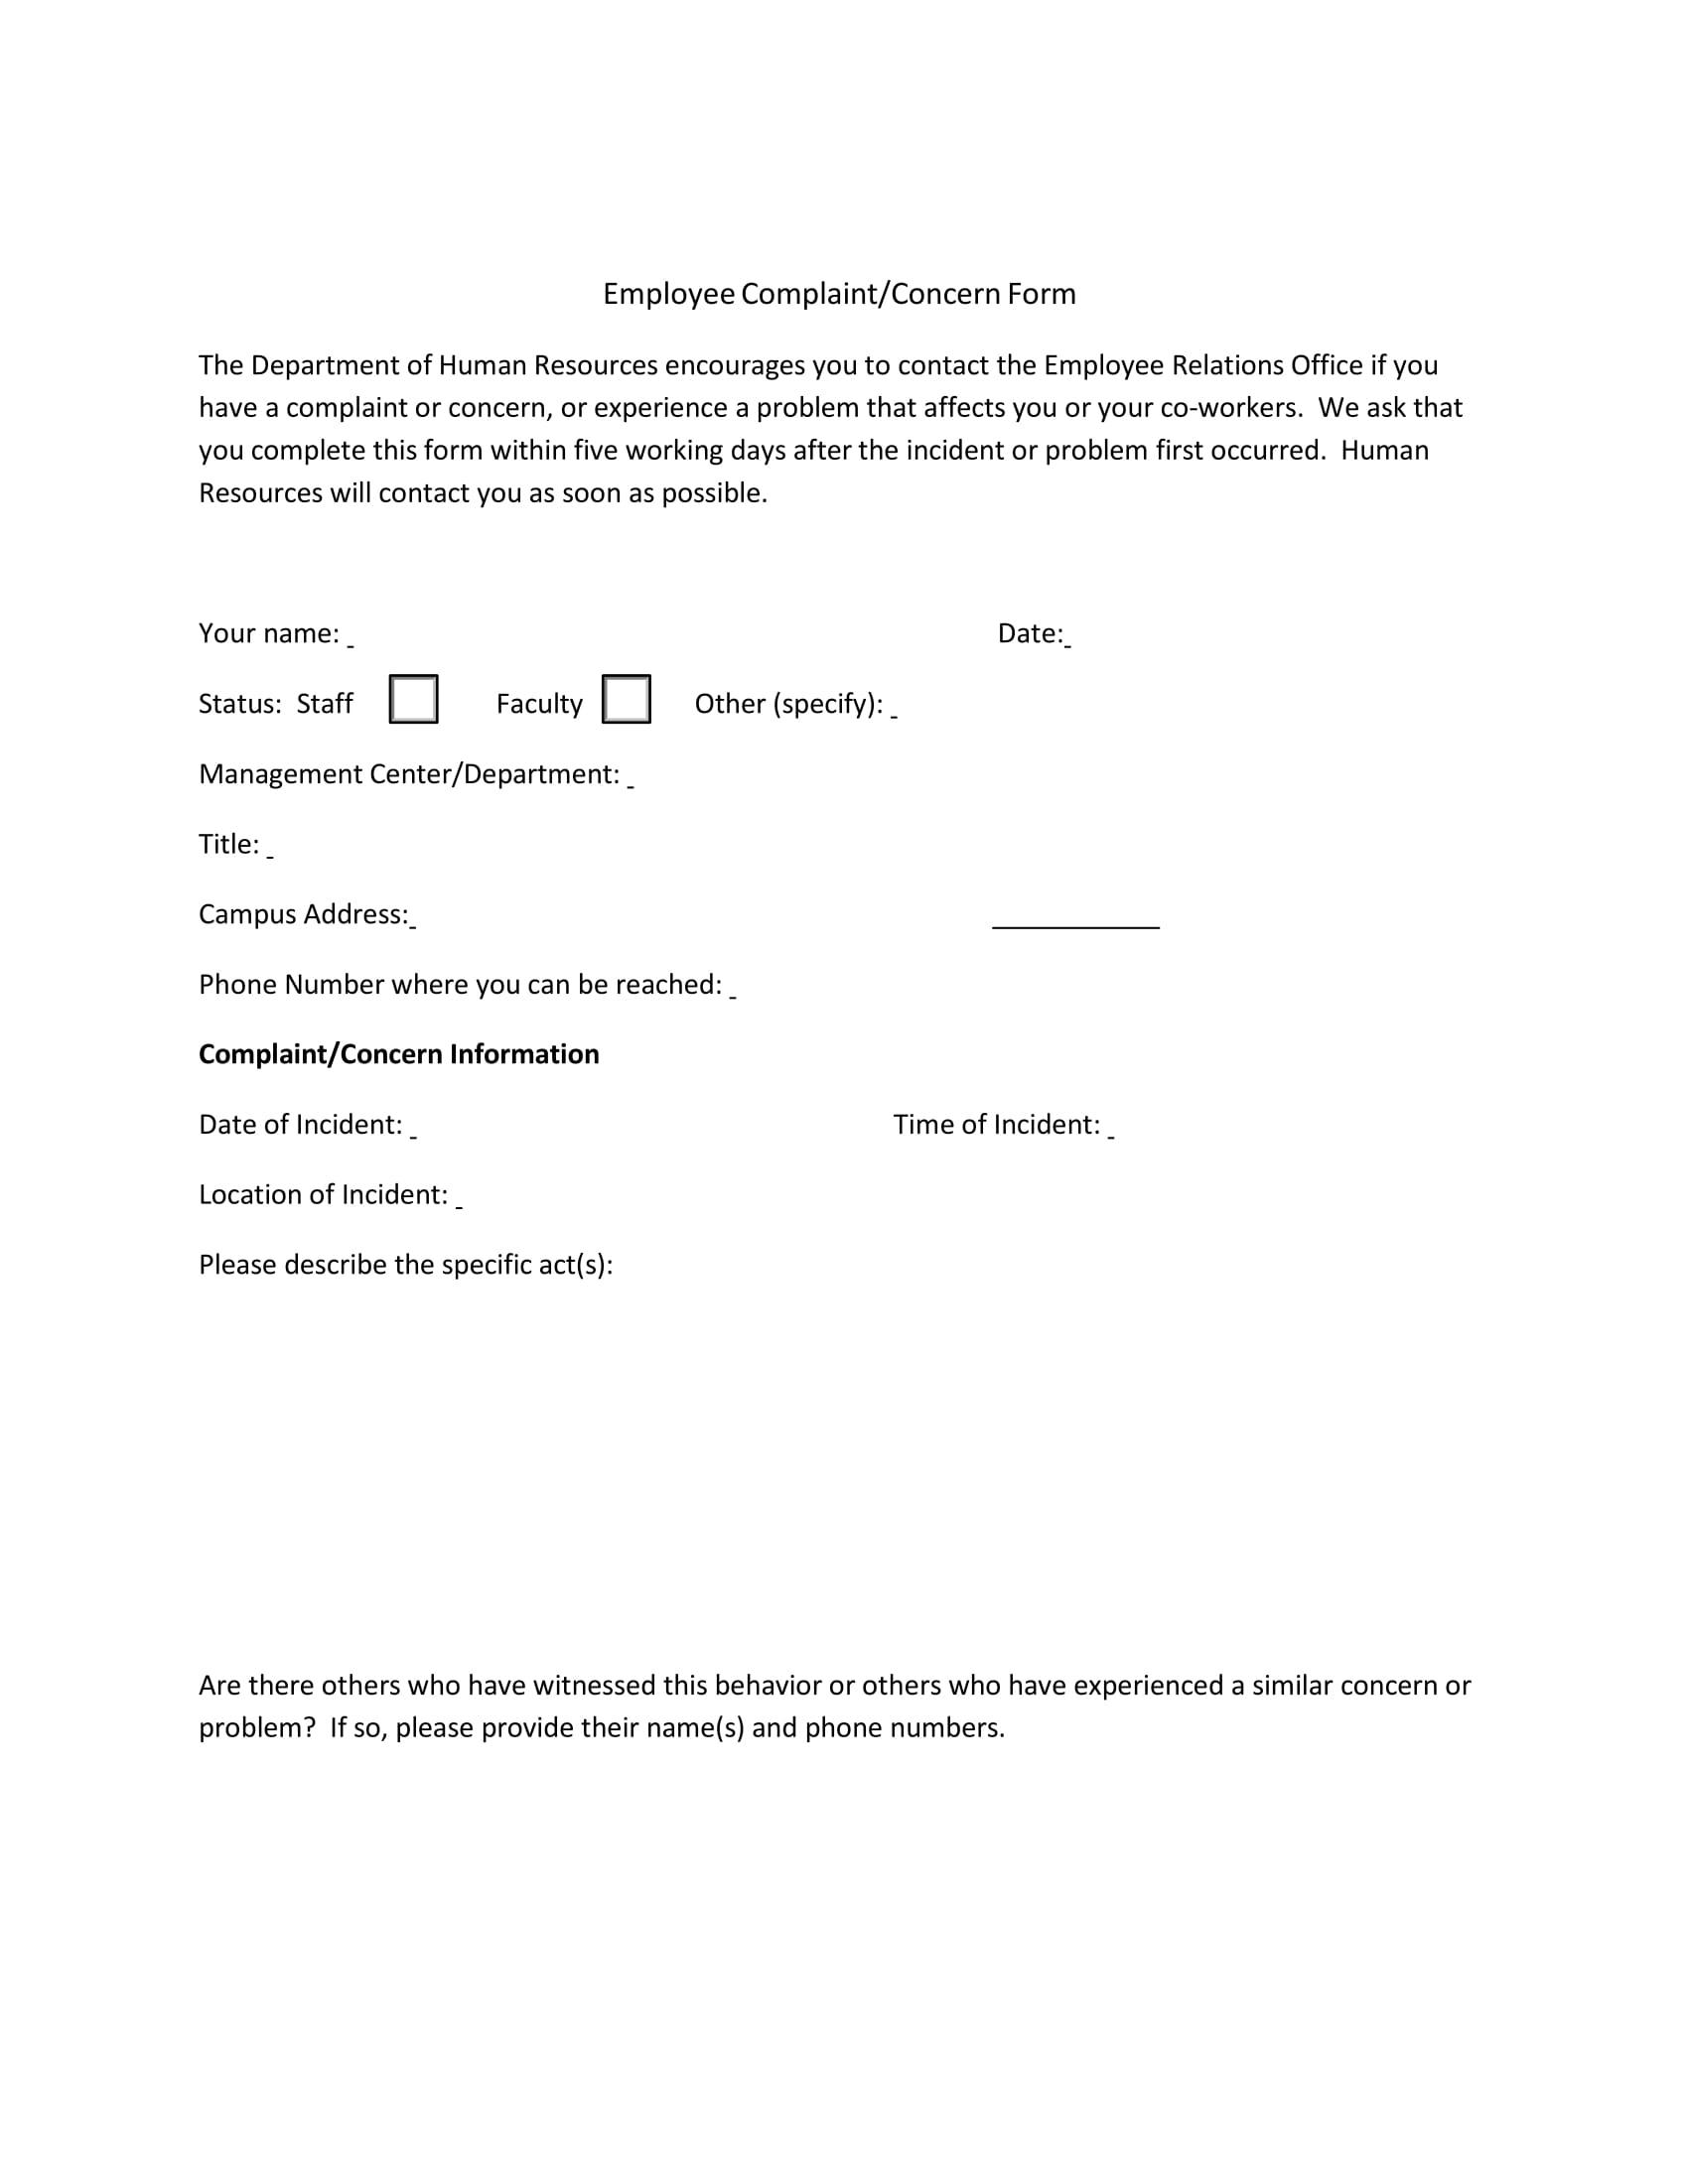 employee complaint concern form 1